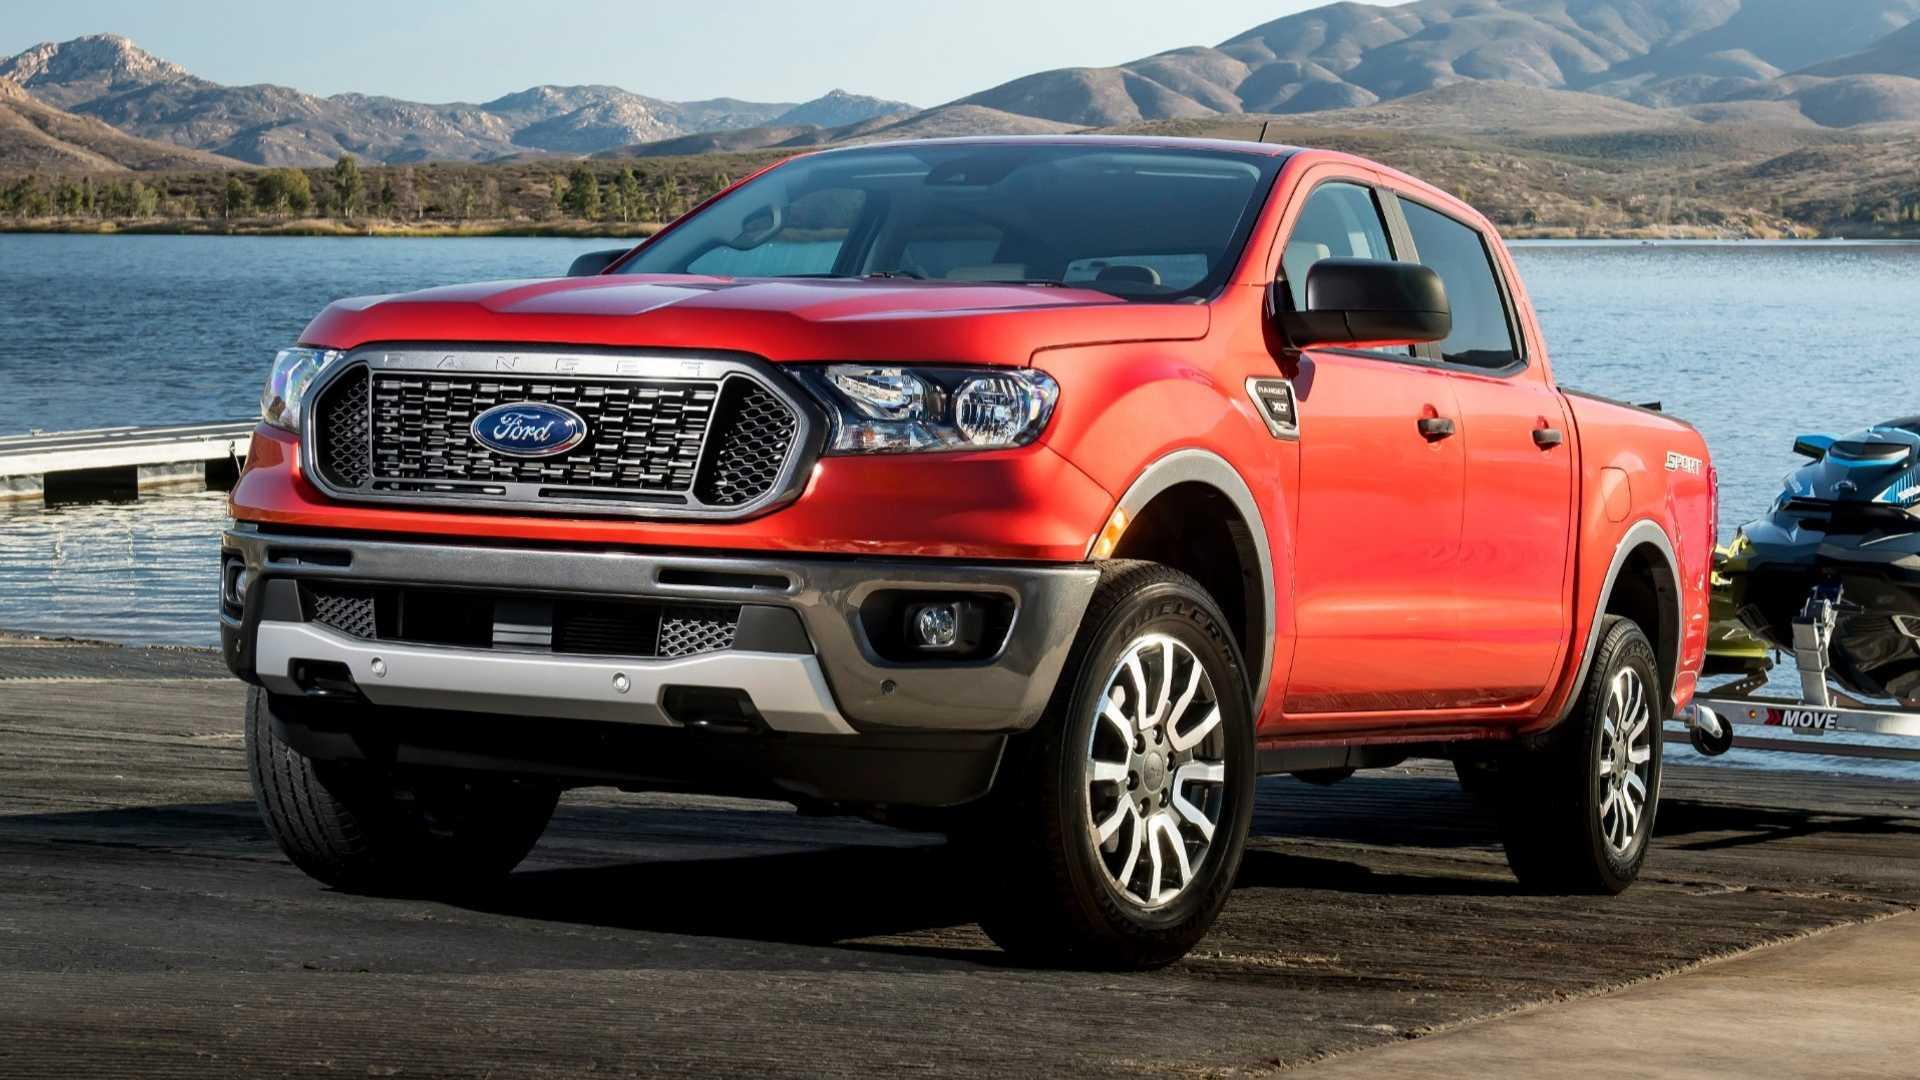 ford-f-150-limited-2019-vs-ford-ranger-cuoc-chien-cua-2-ong-hoang-ban-tai